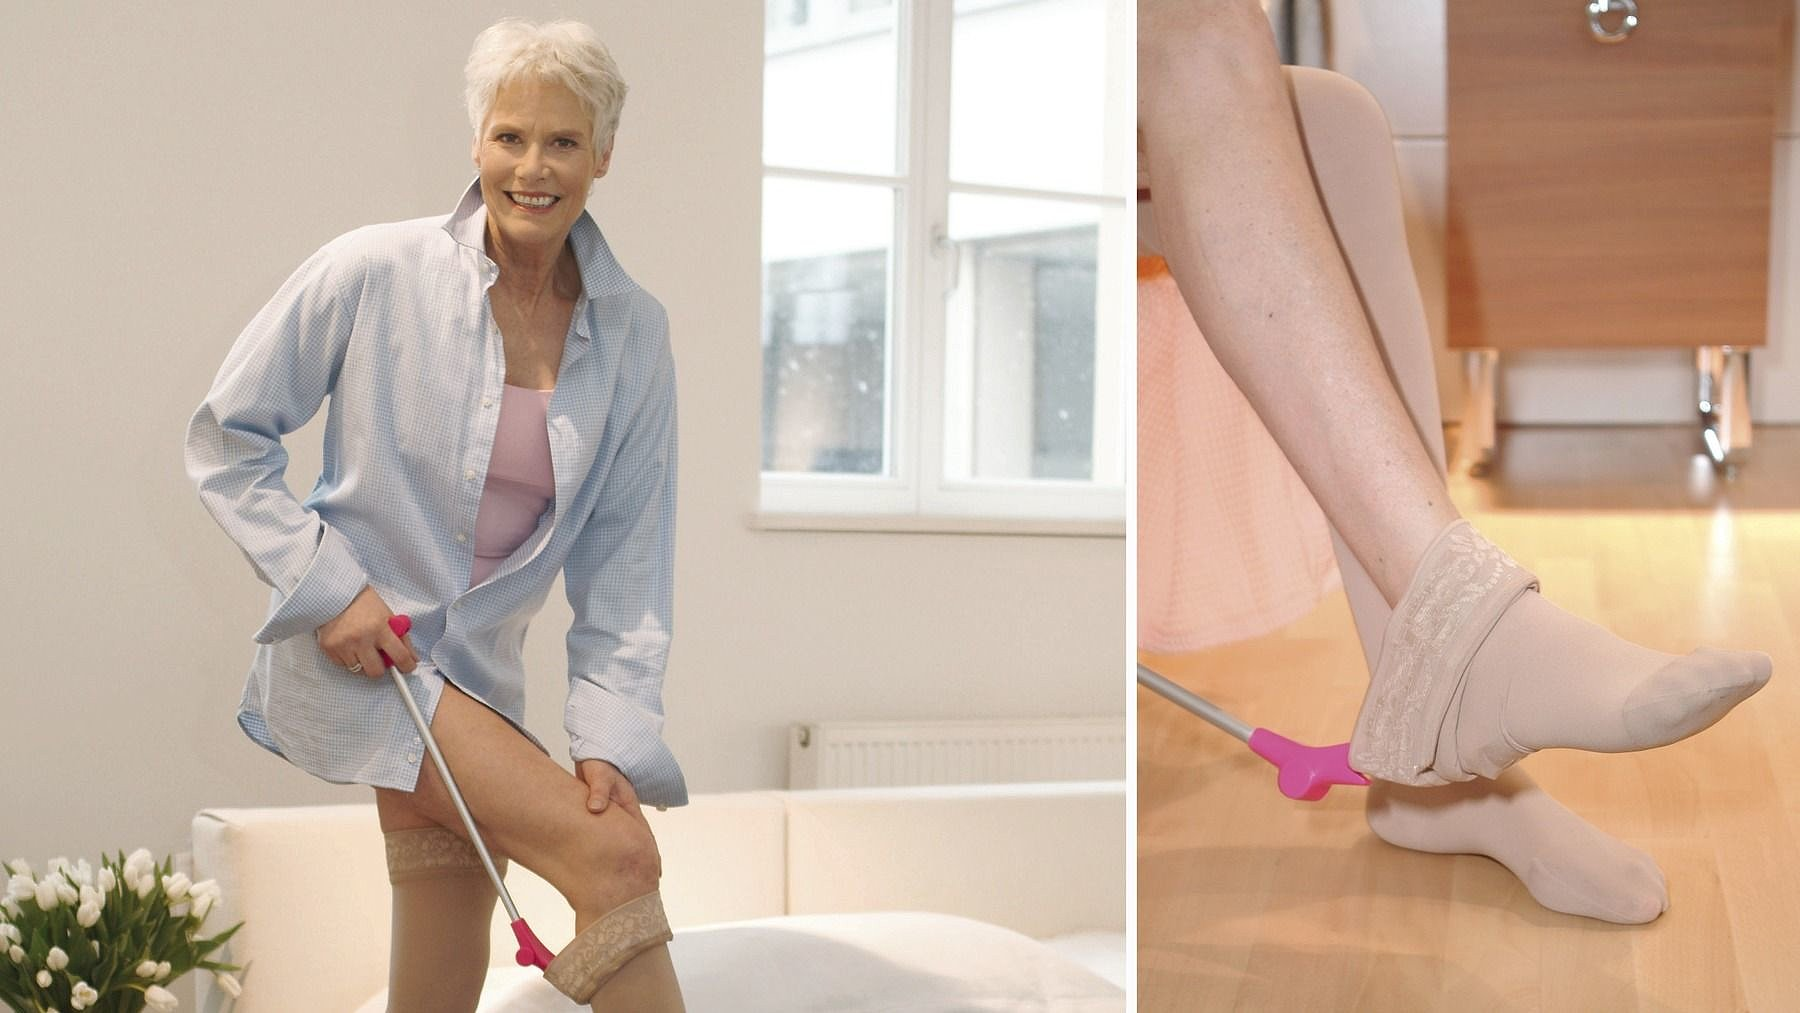 Medi Butler off: Doffing aid for compression stockings